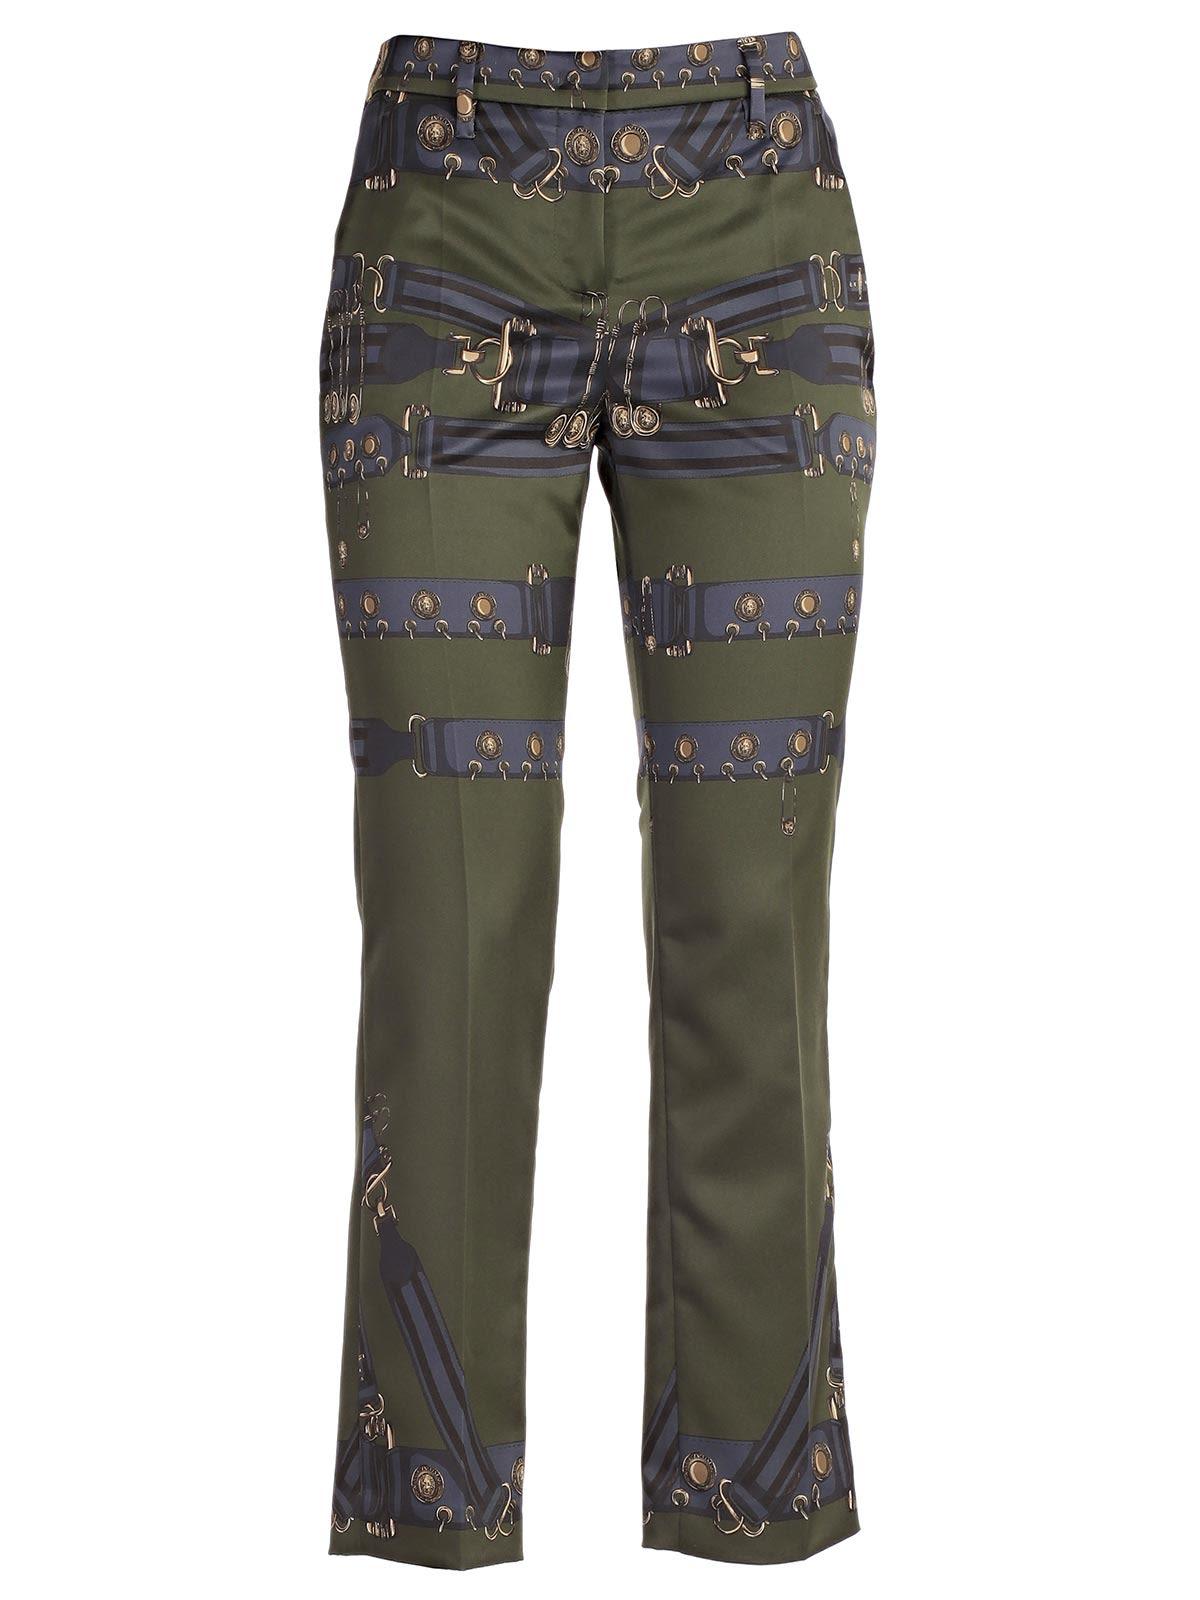 Versus Versace Strap Print Skinny Trousers